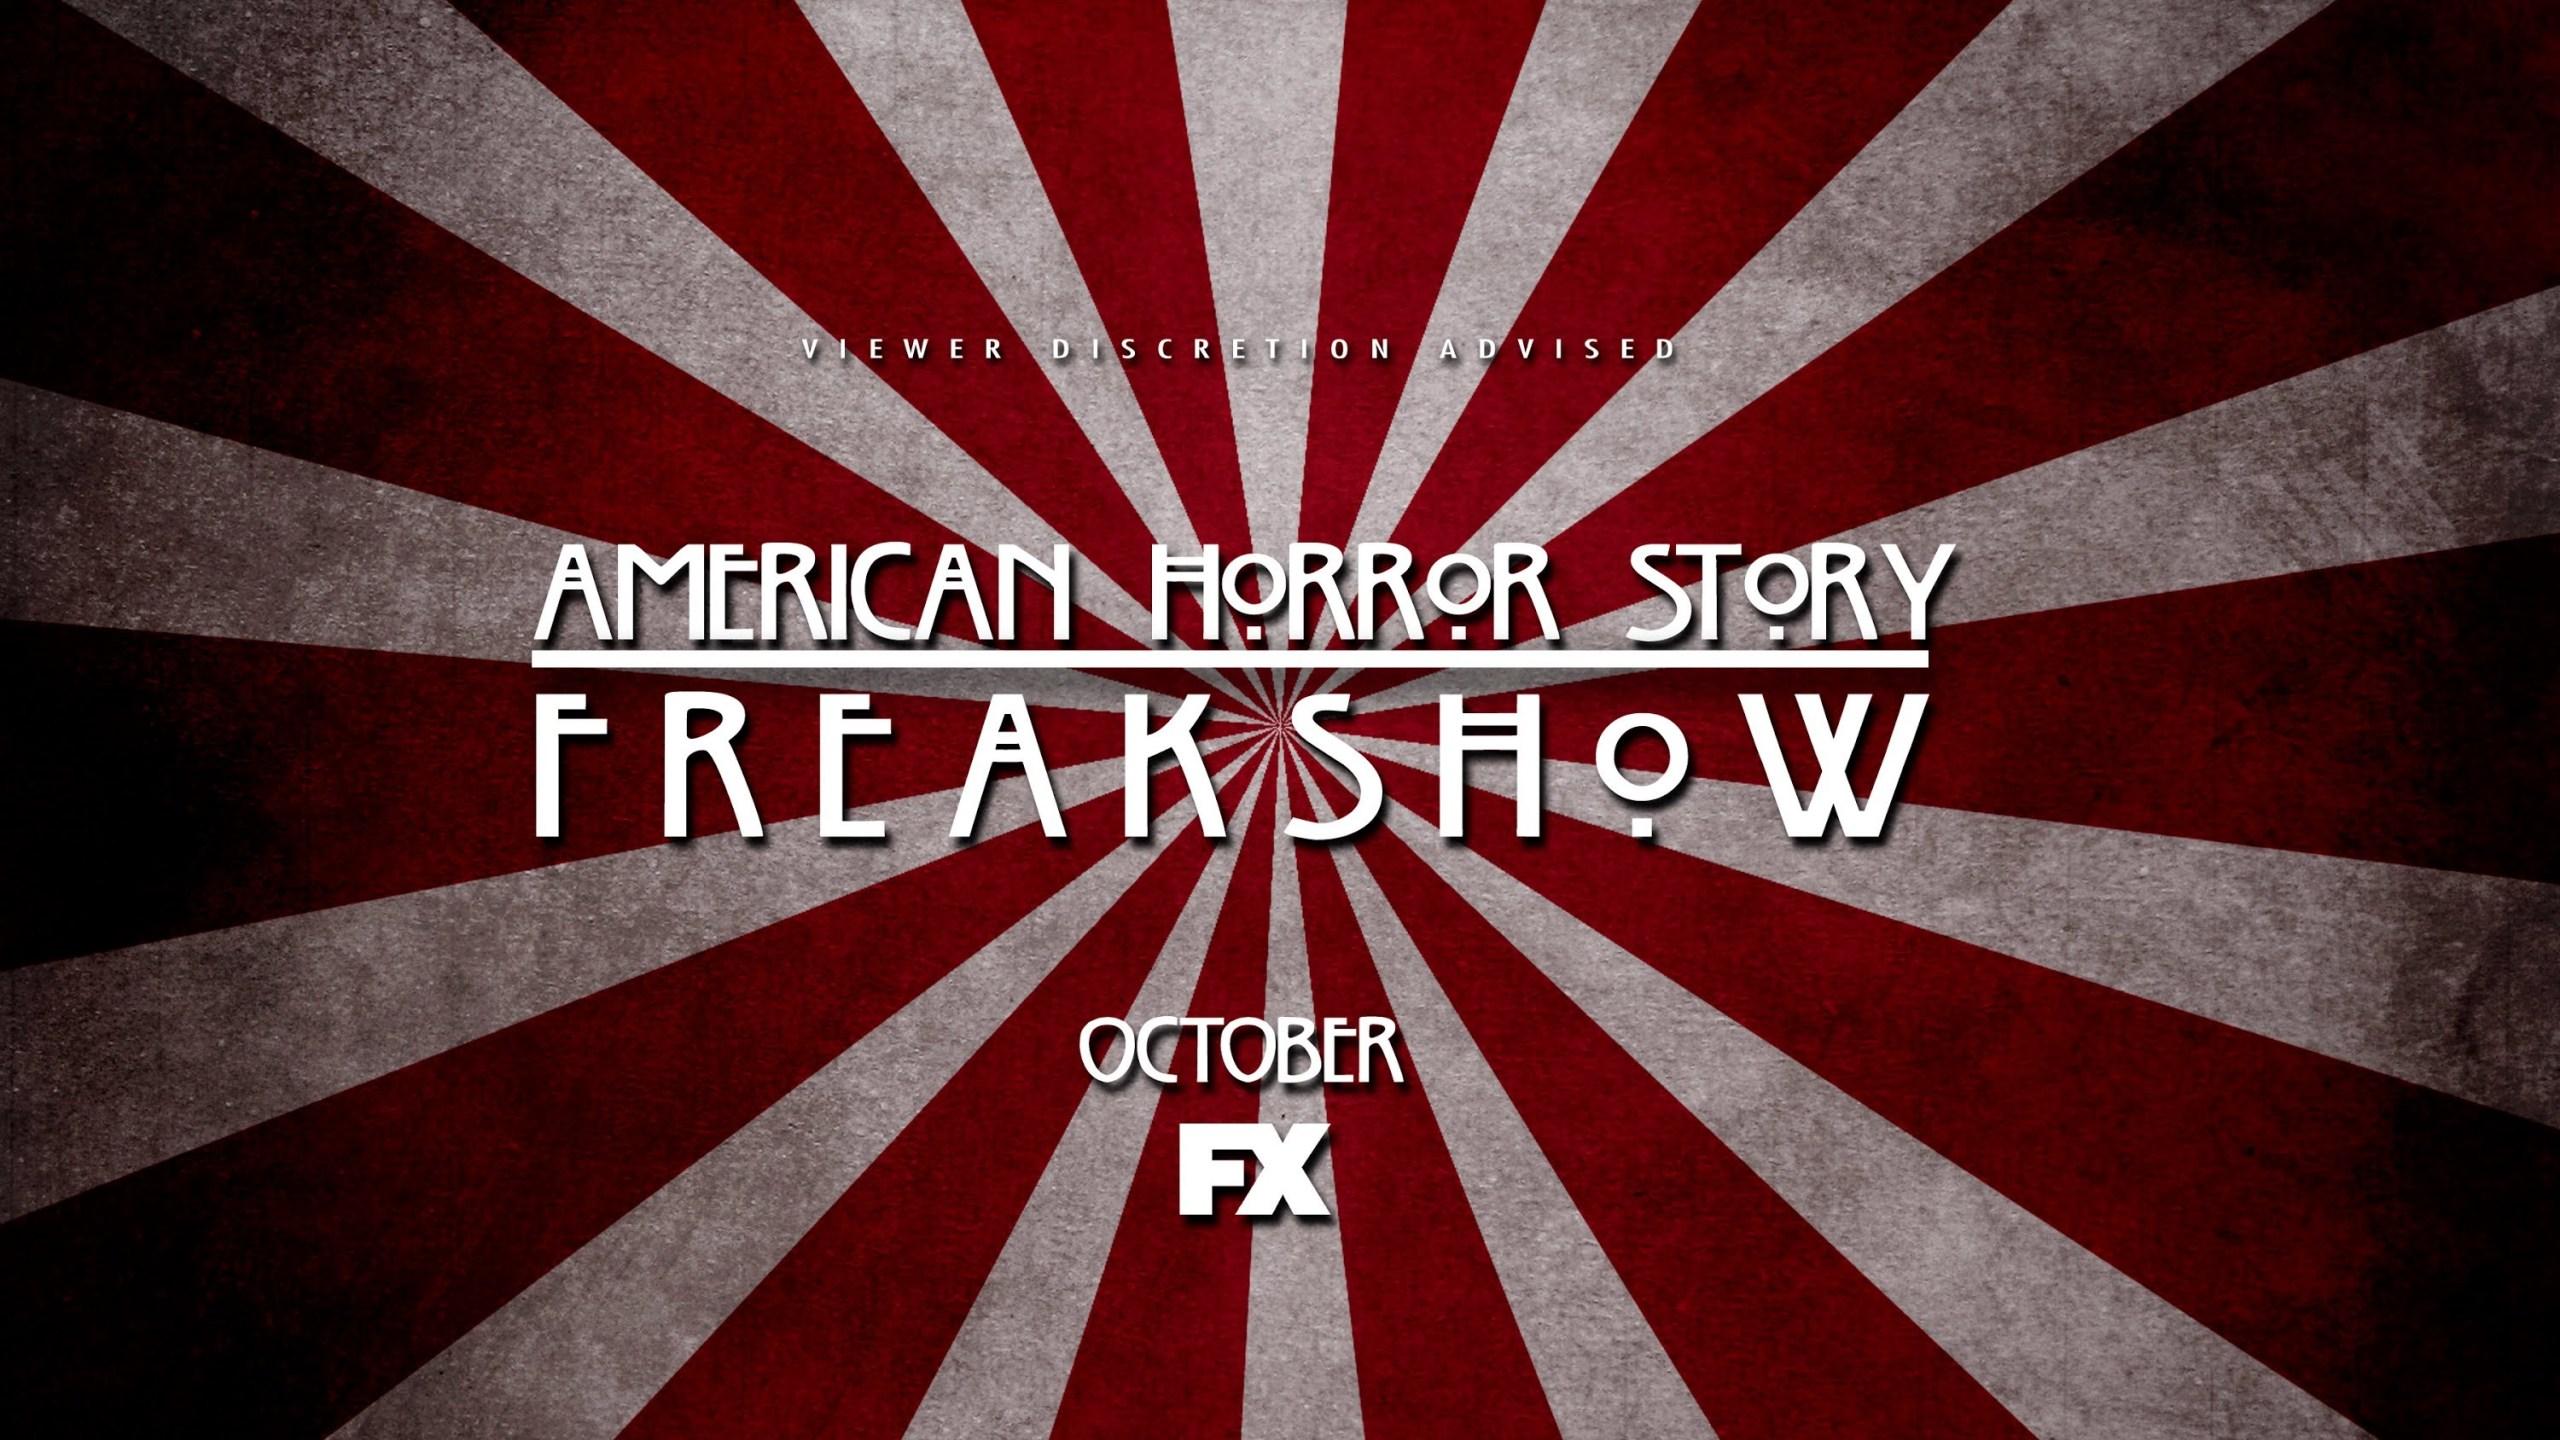 American Horror Story Freakshow